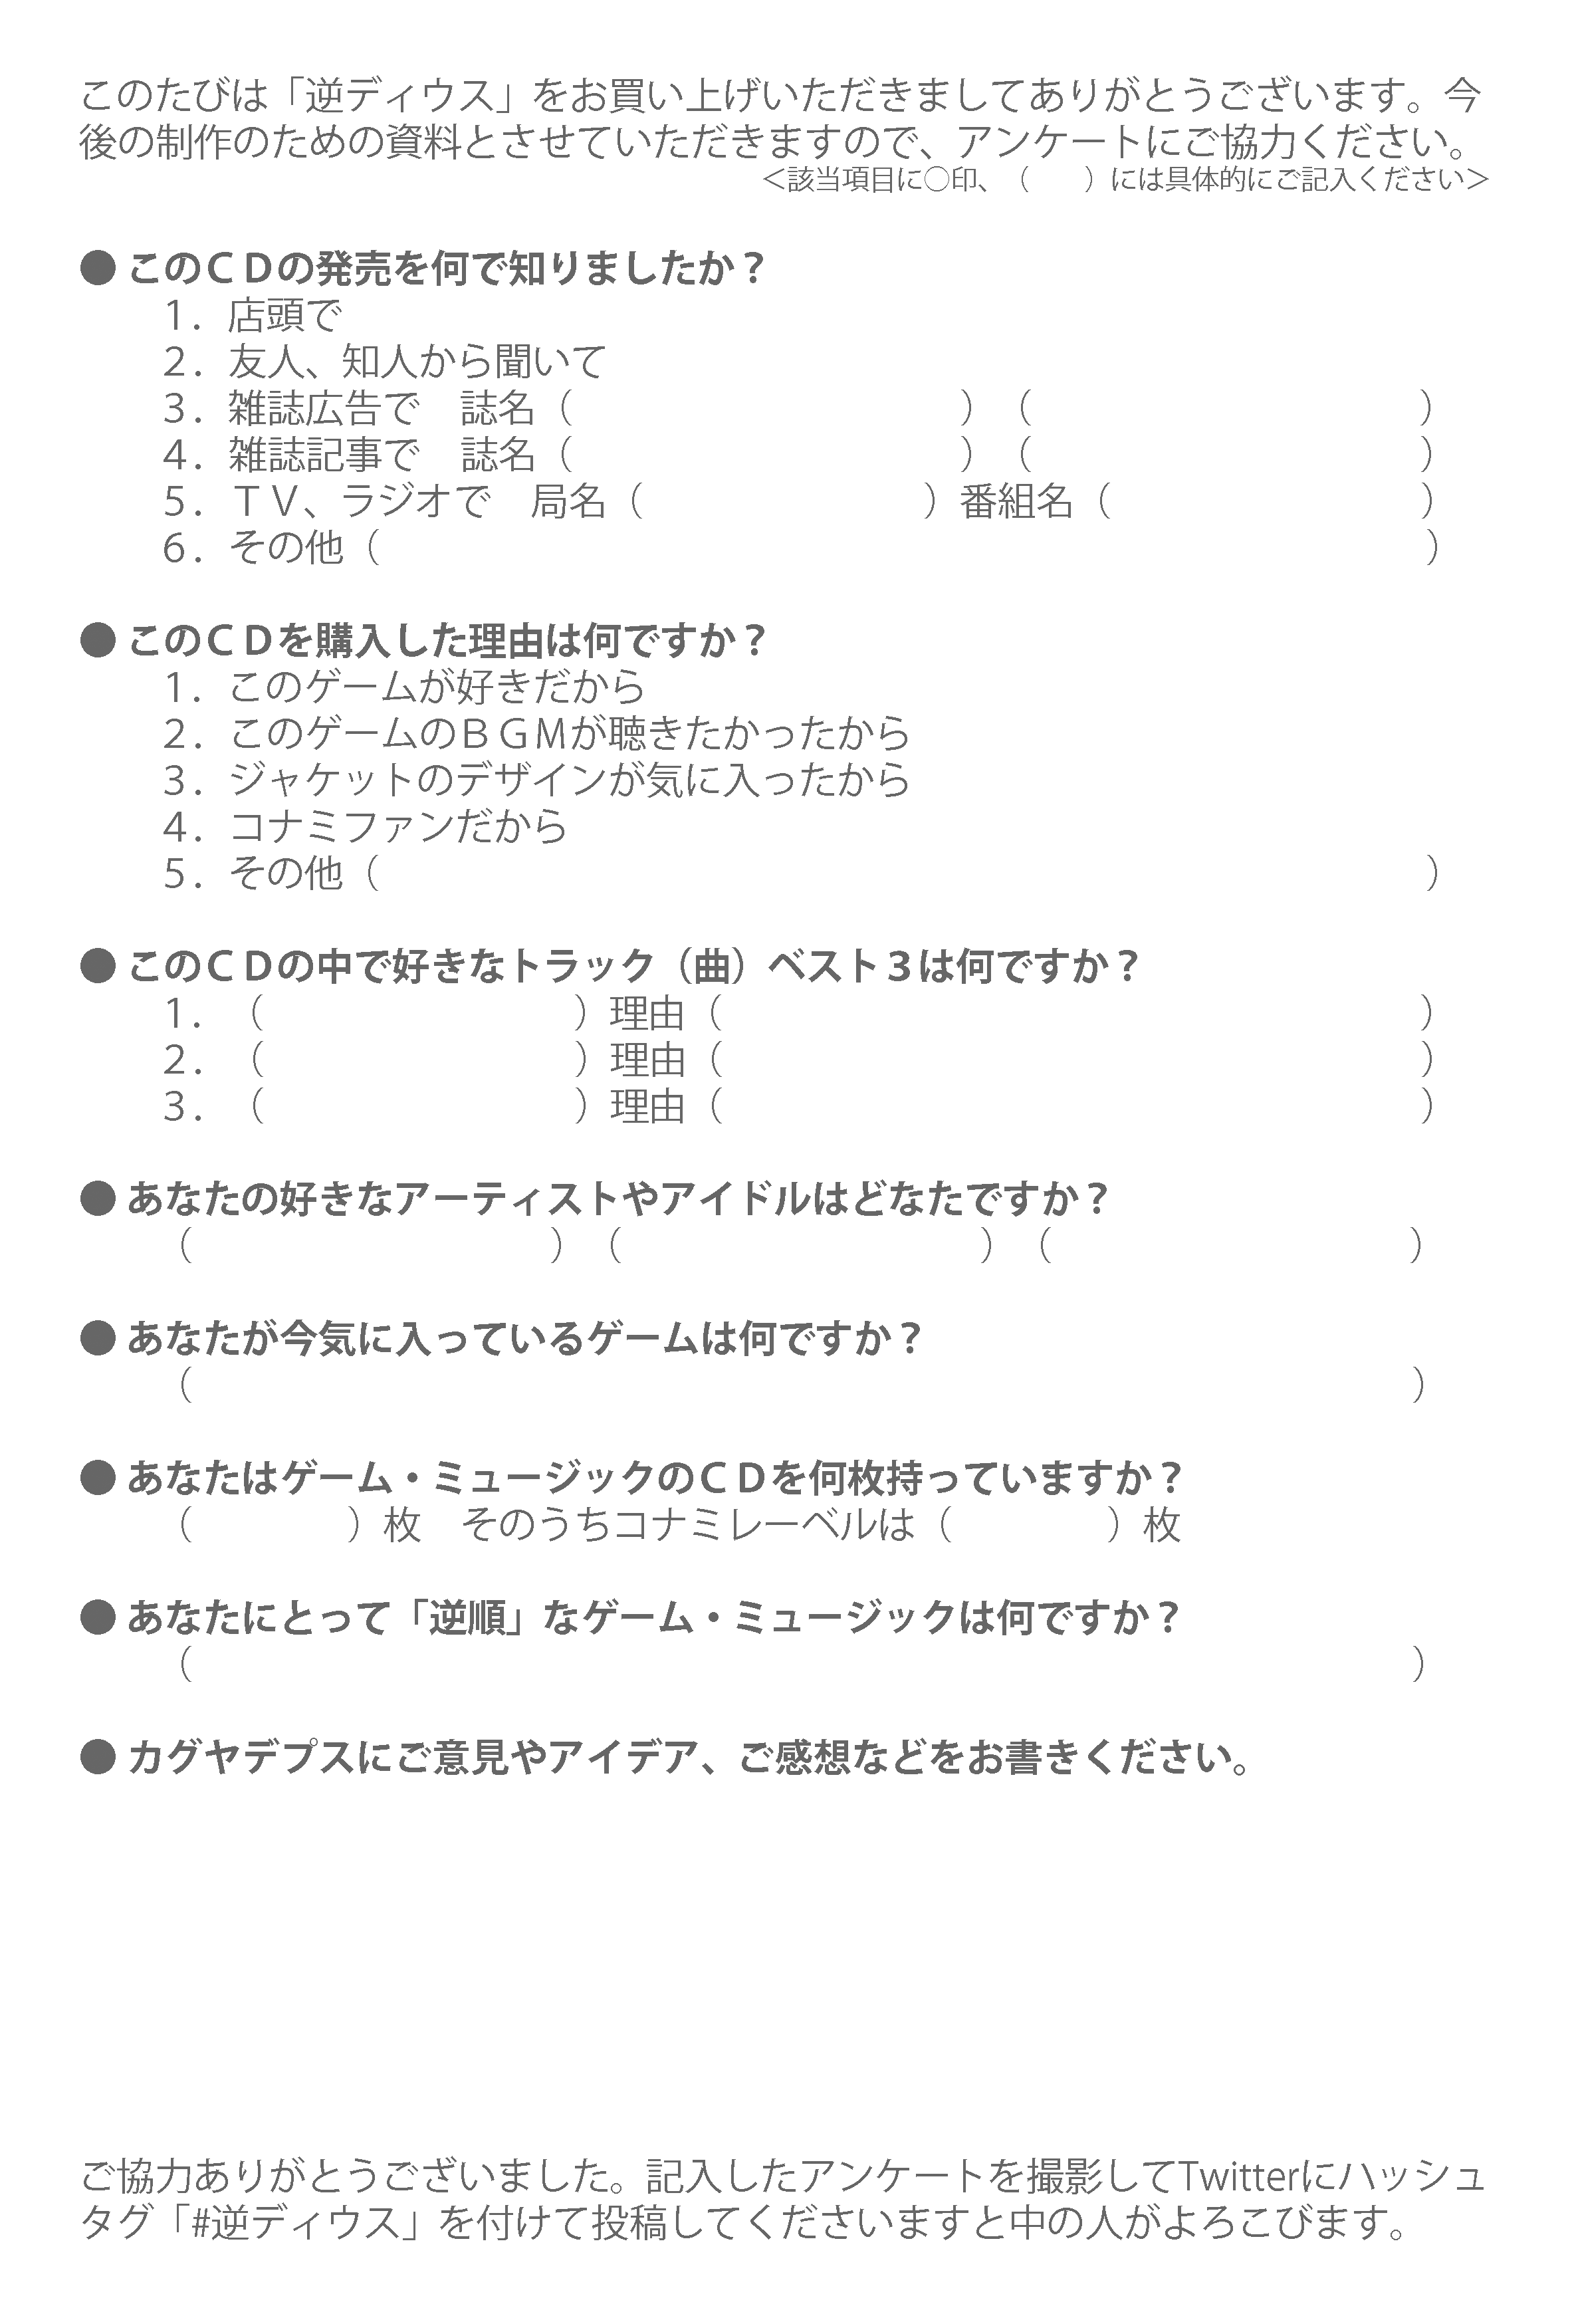 f:id:moetsukiro:20200105202011p:plain:w300